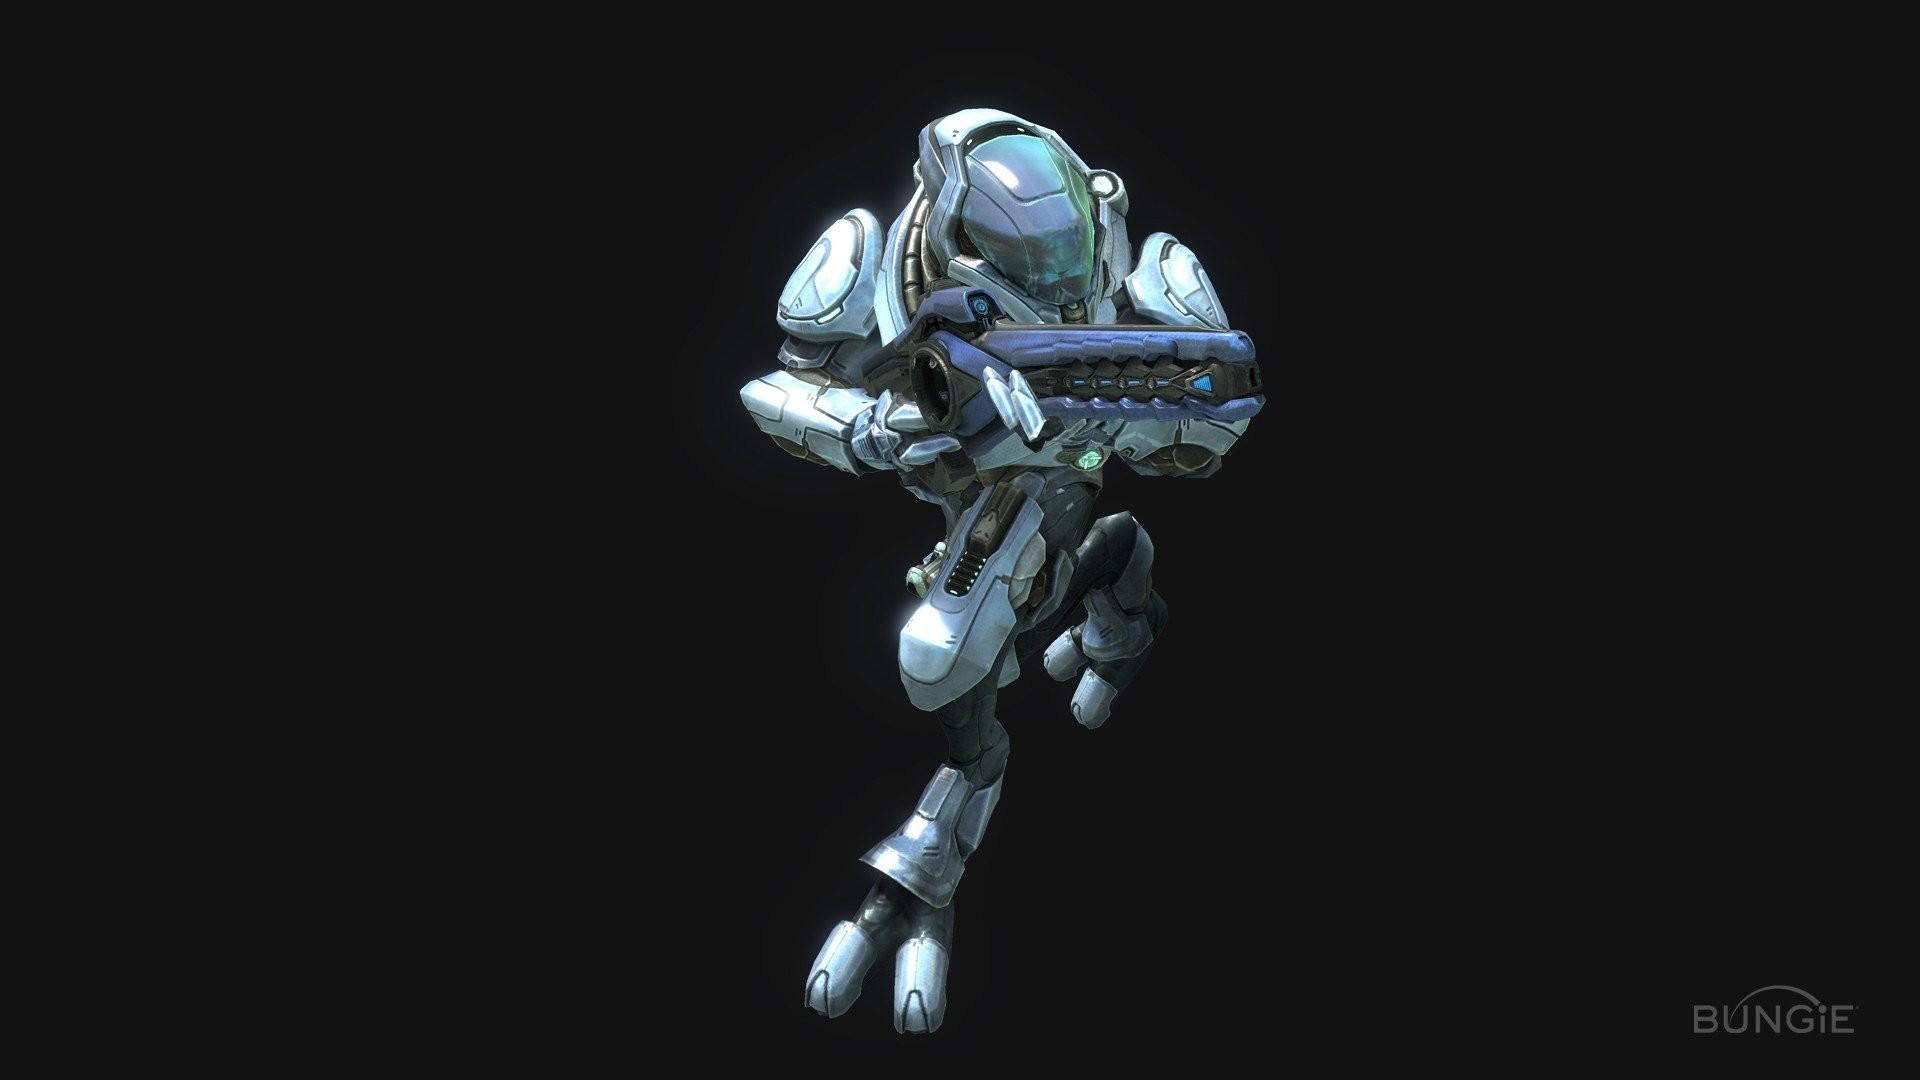 Video games Halo elite science fiction Covenant Reach focus rifle elite  ranger wallpaper     246822   WallpaperUP